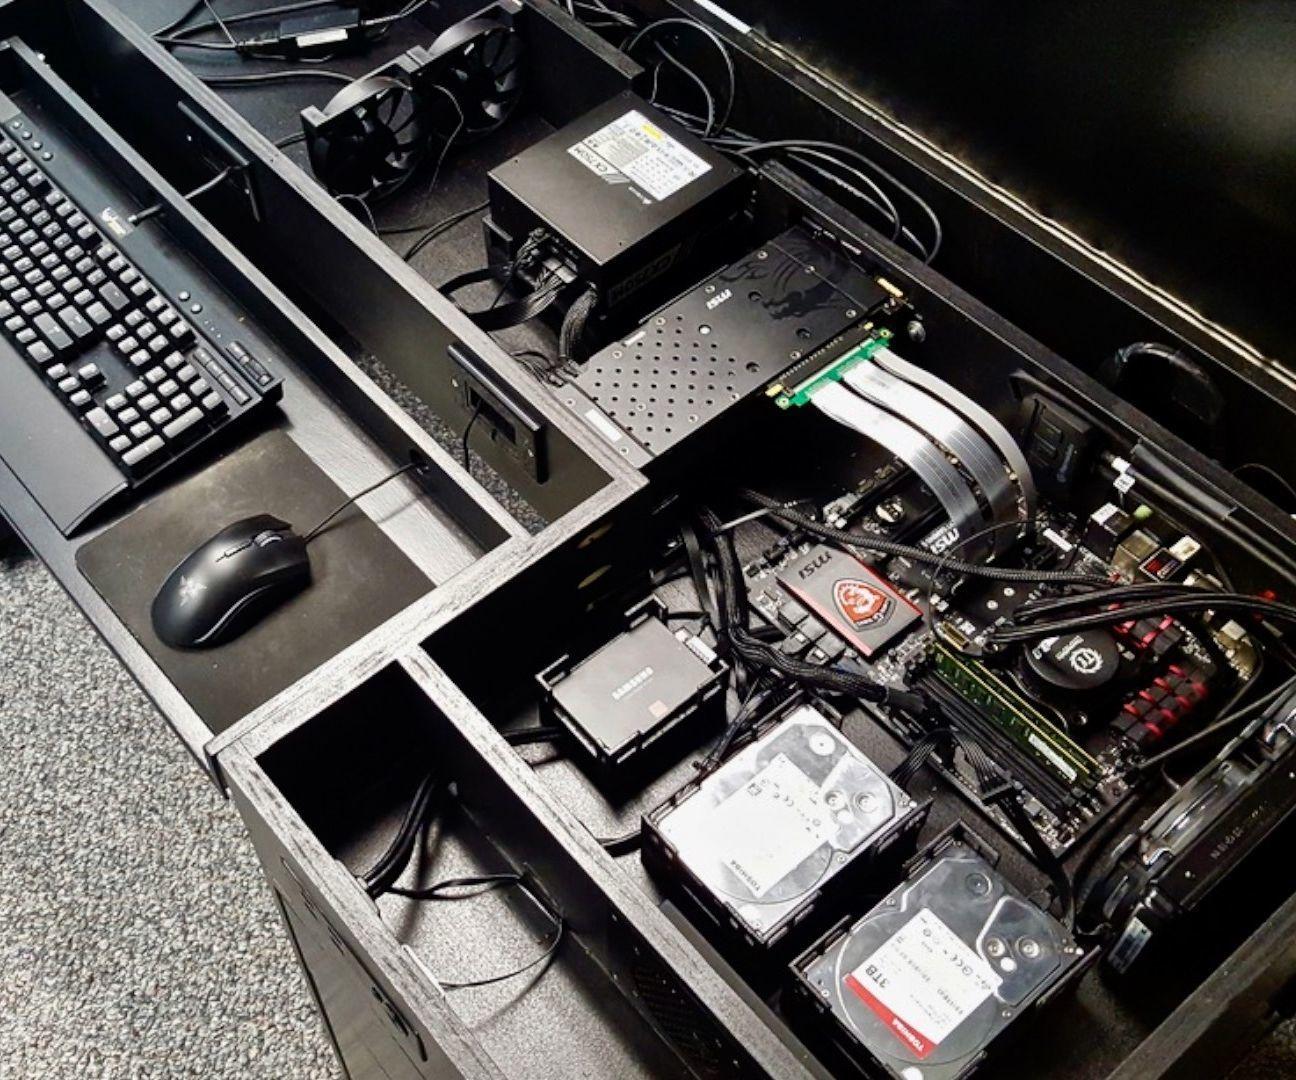 Building A Computer Desk Diy Desk Pc Built In Computer Desk